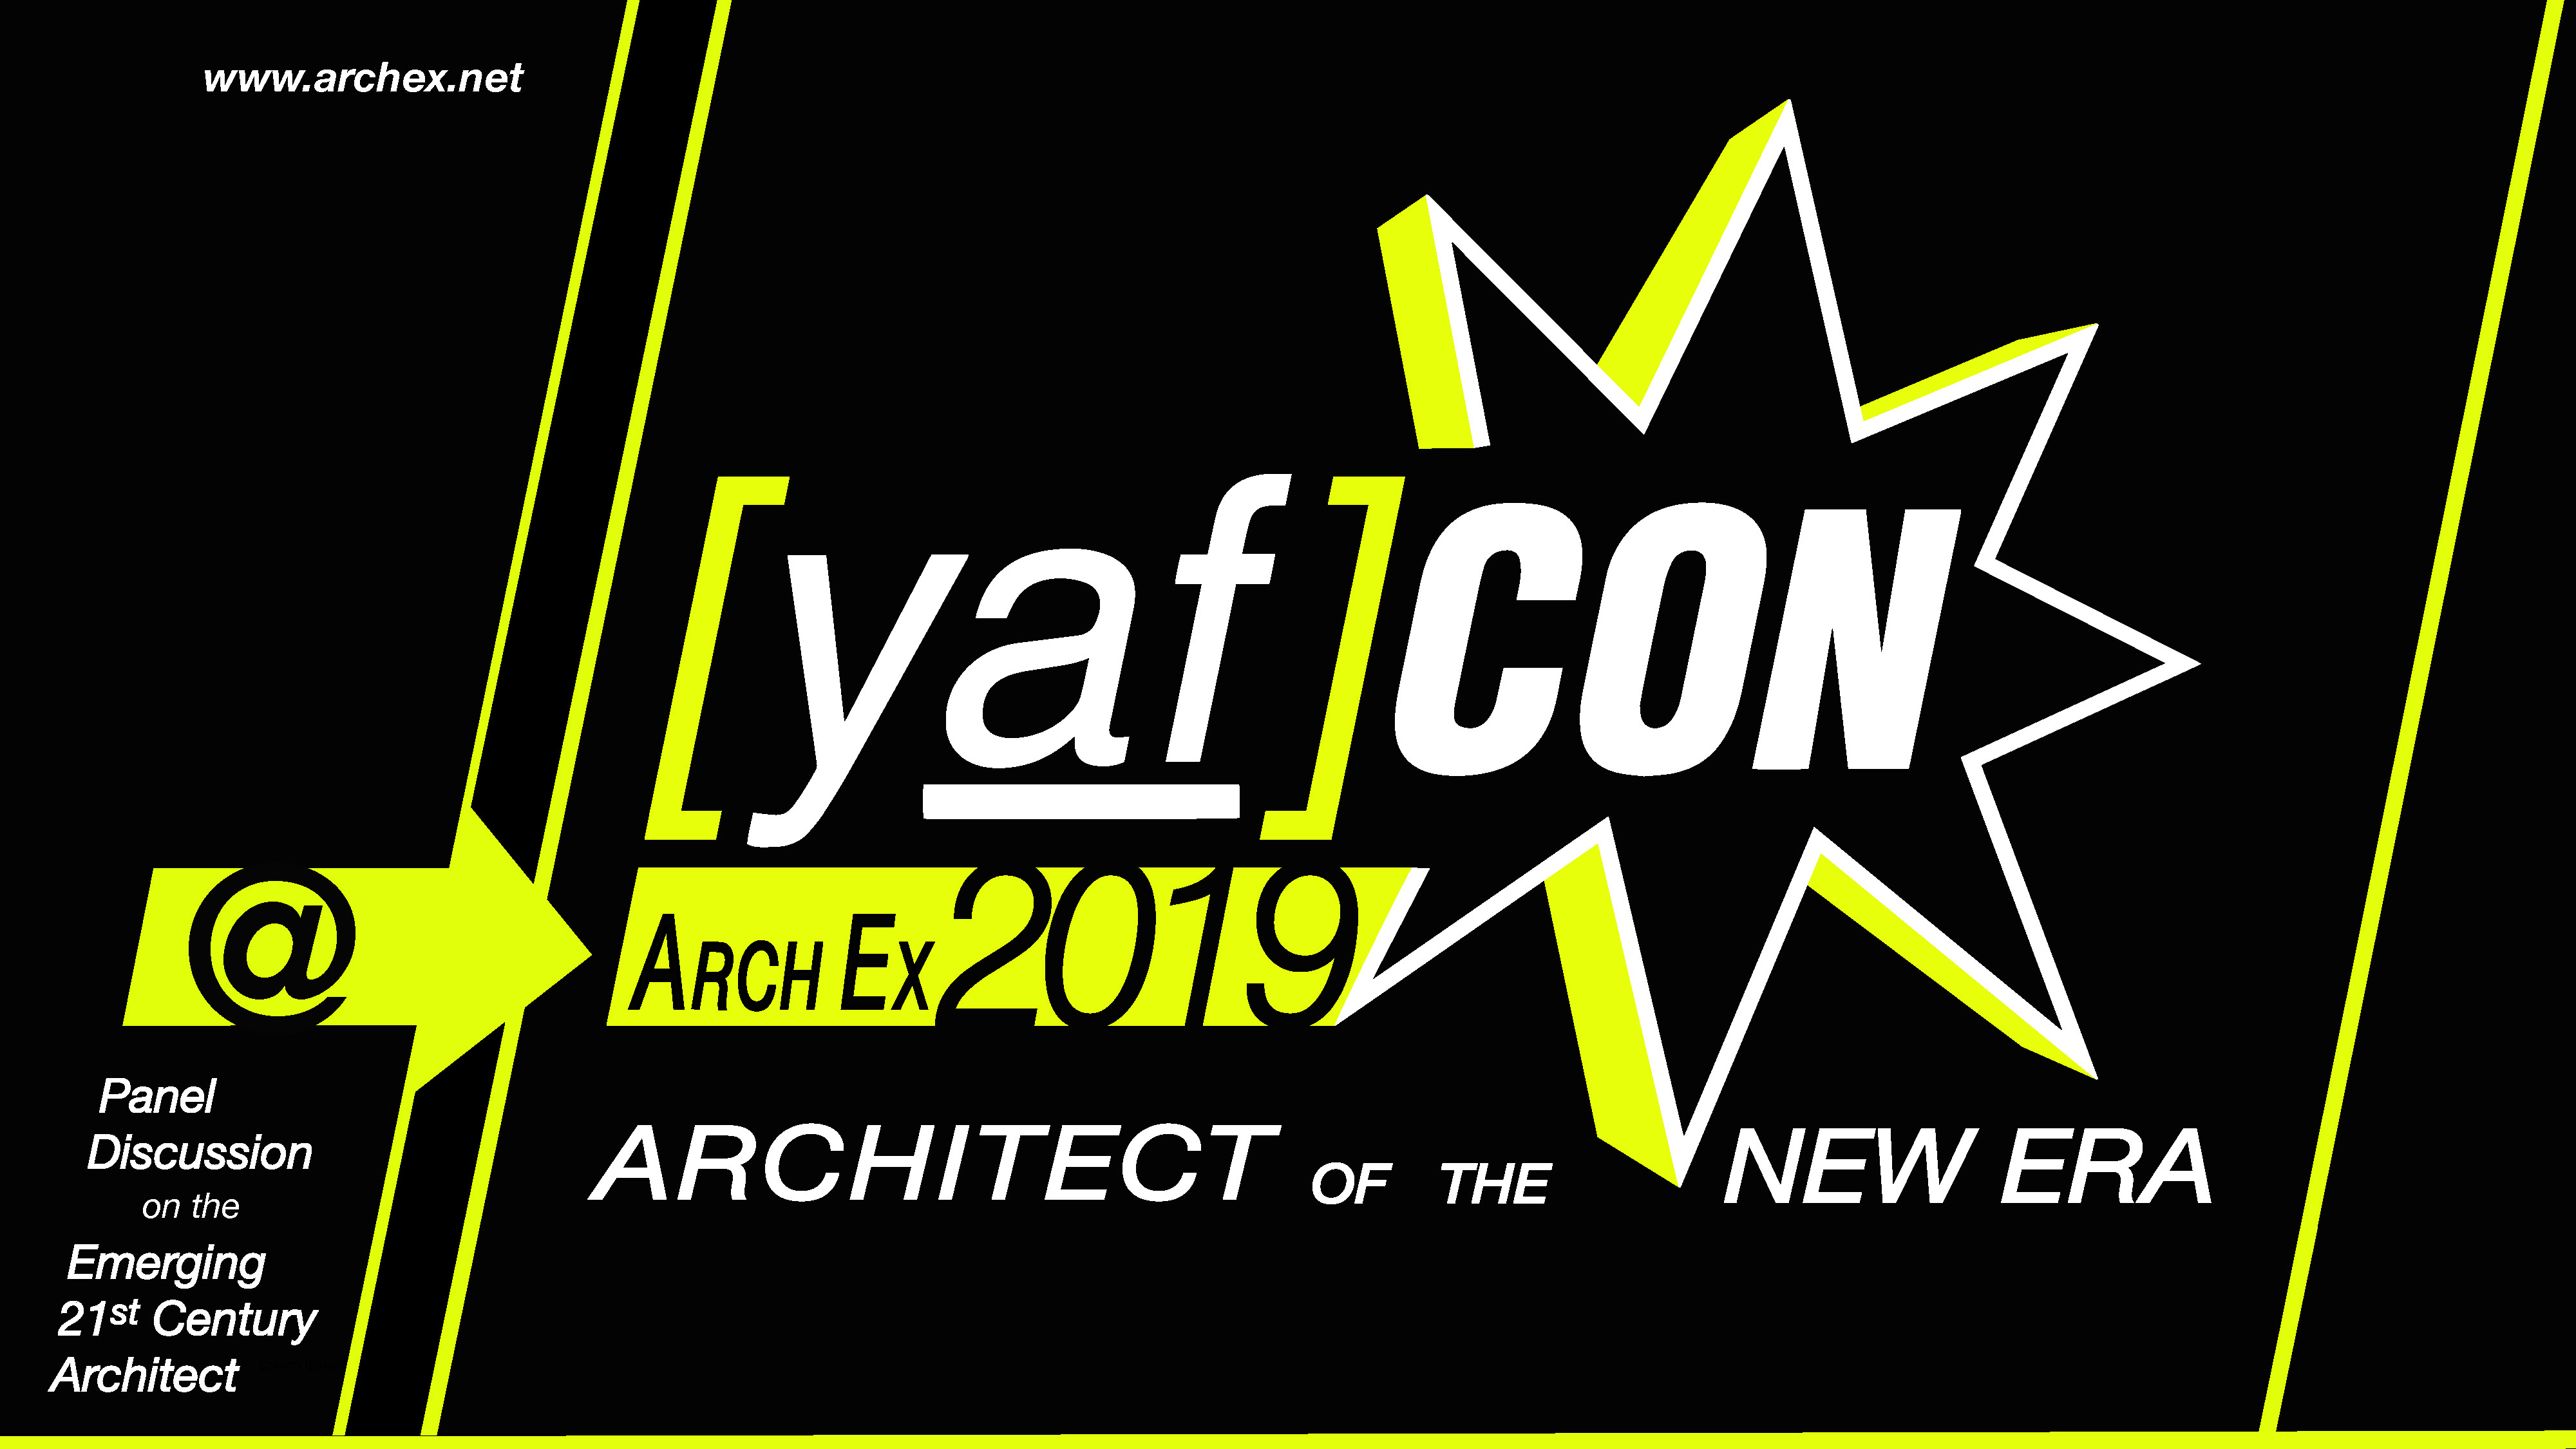 yadCON 2019